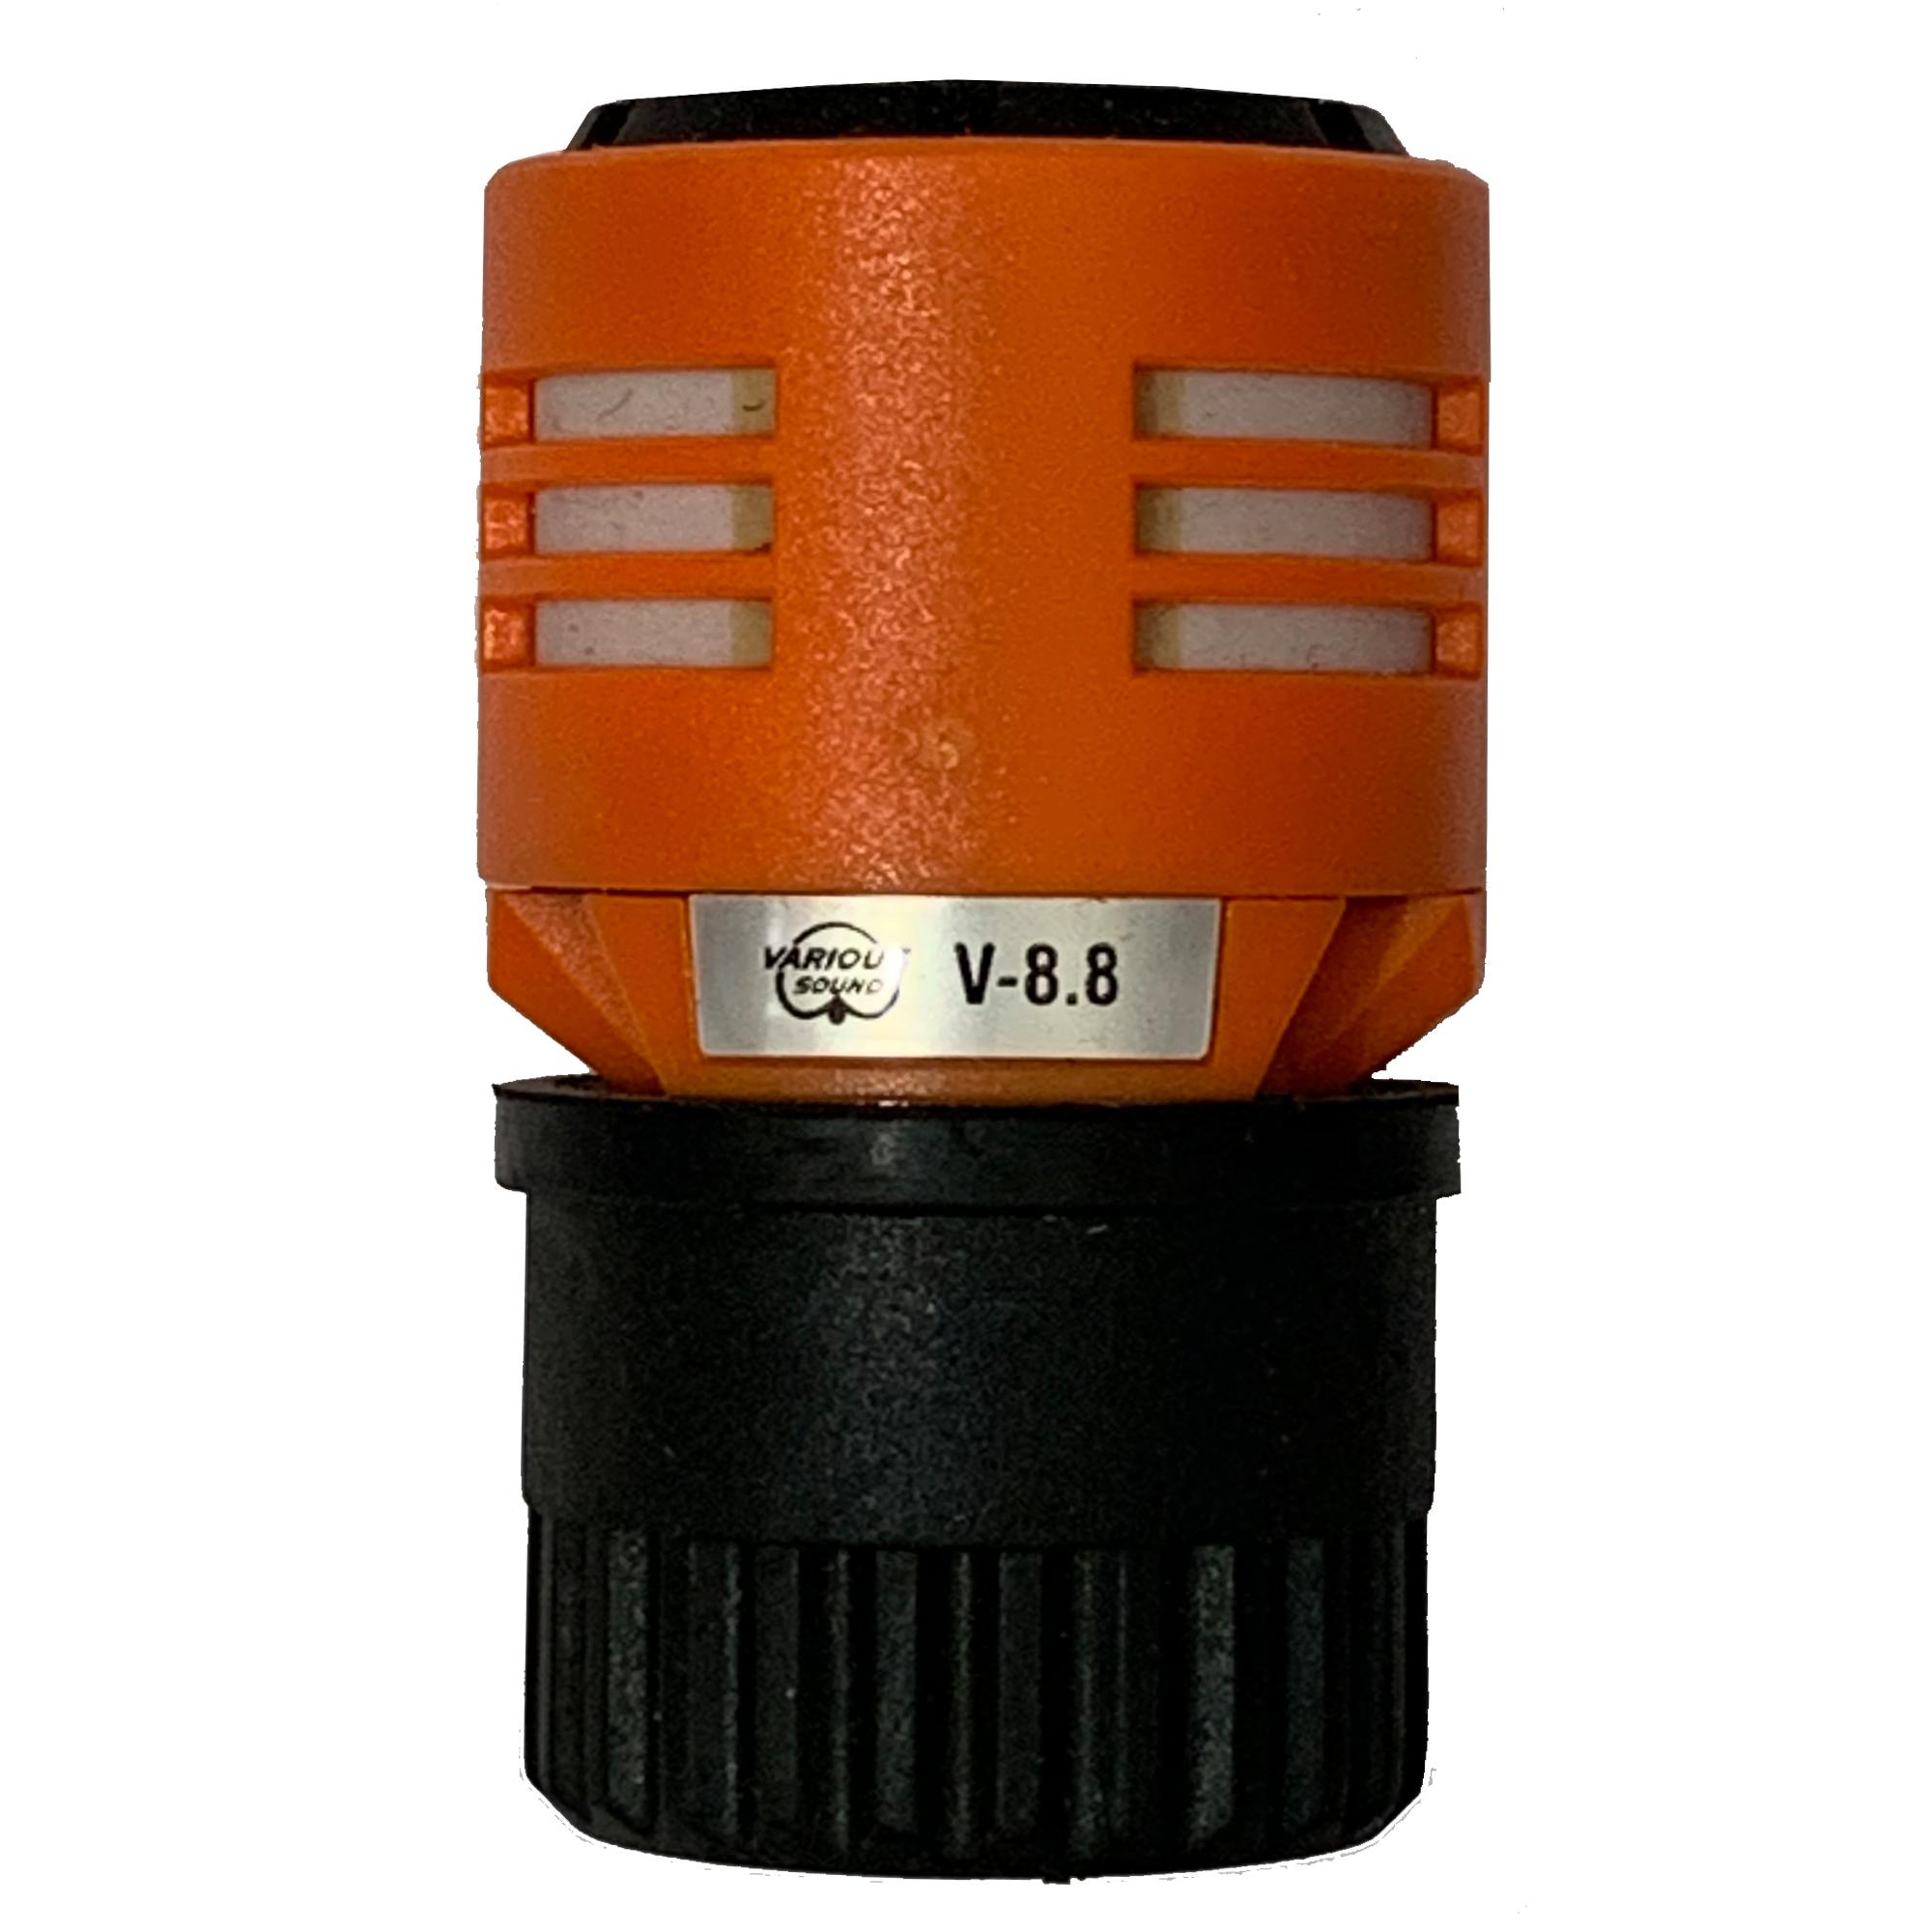 کپسول میکروفن واریوس کد V-8.8